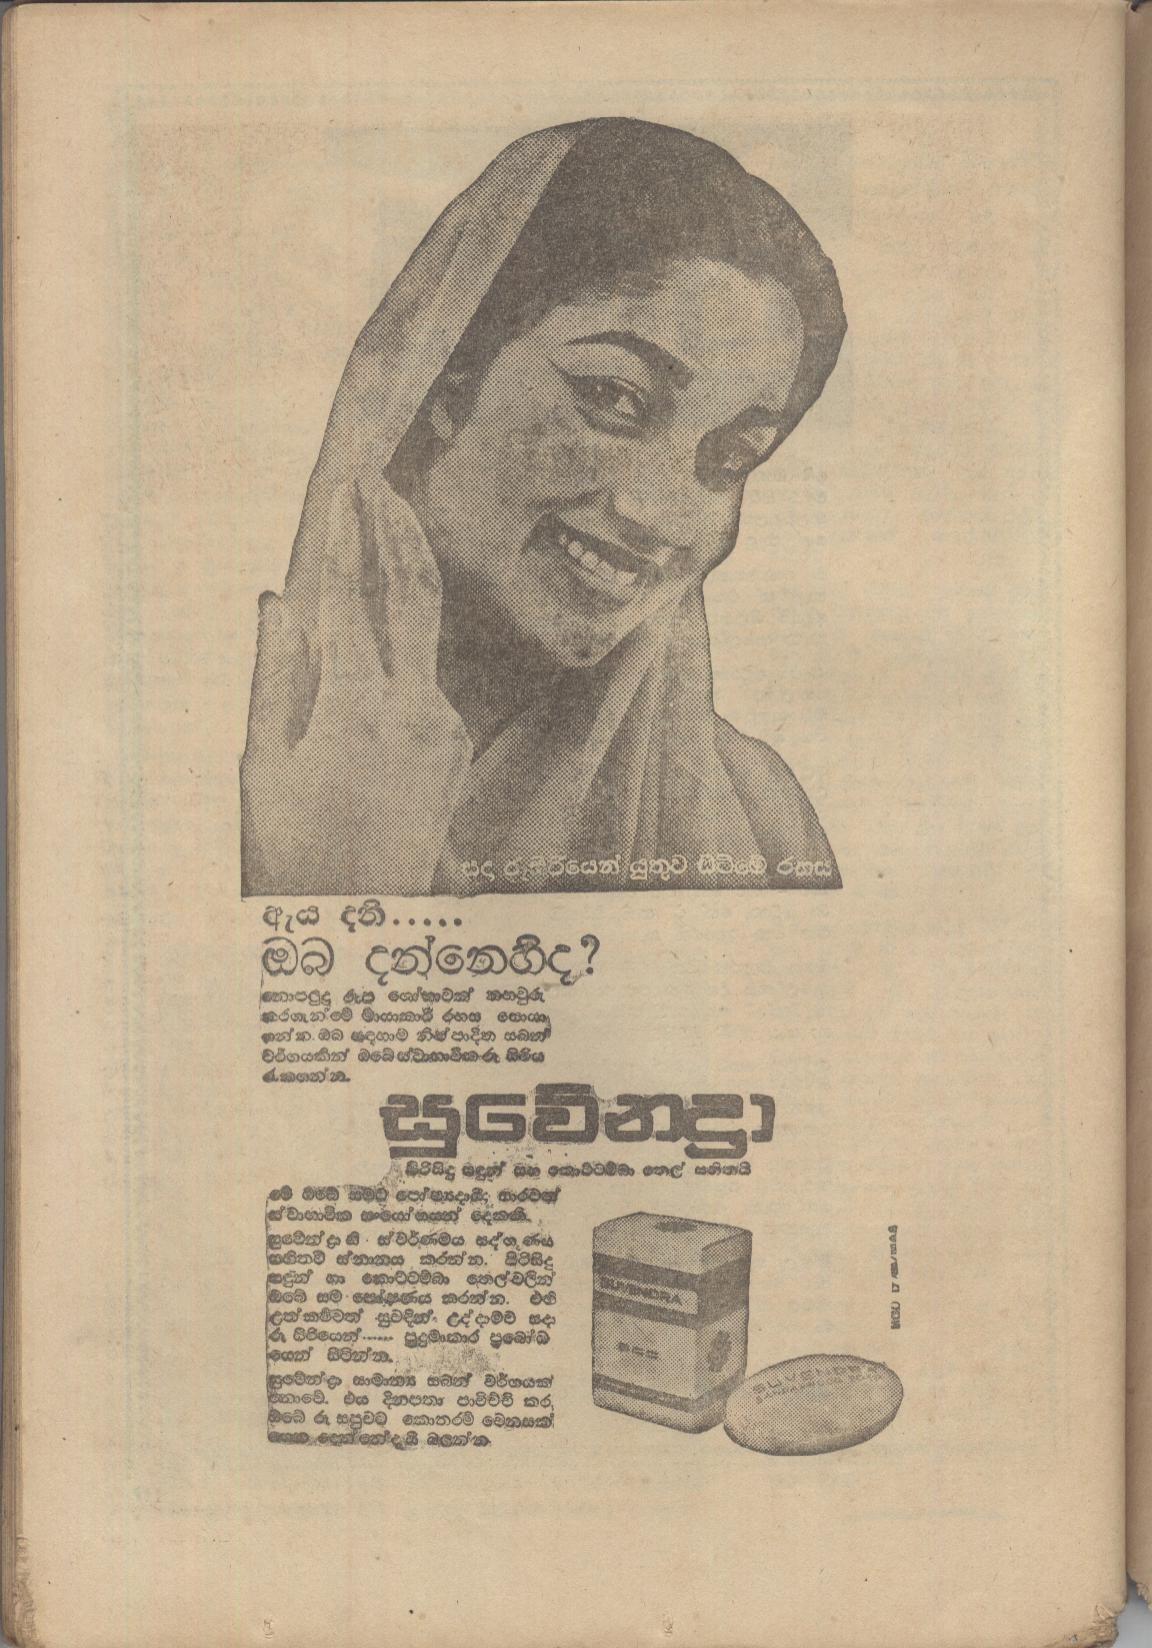 Srilankaoldpaperadvertisement Vintage Advertisements Vintage Paper Art